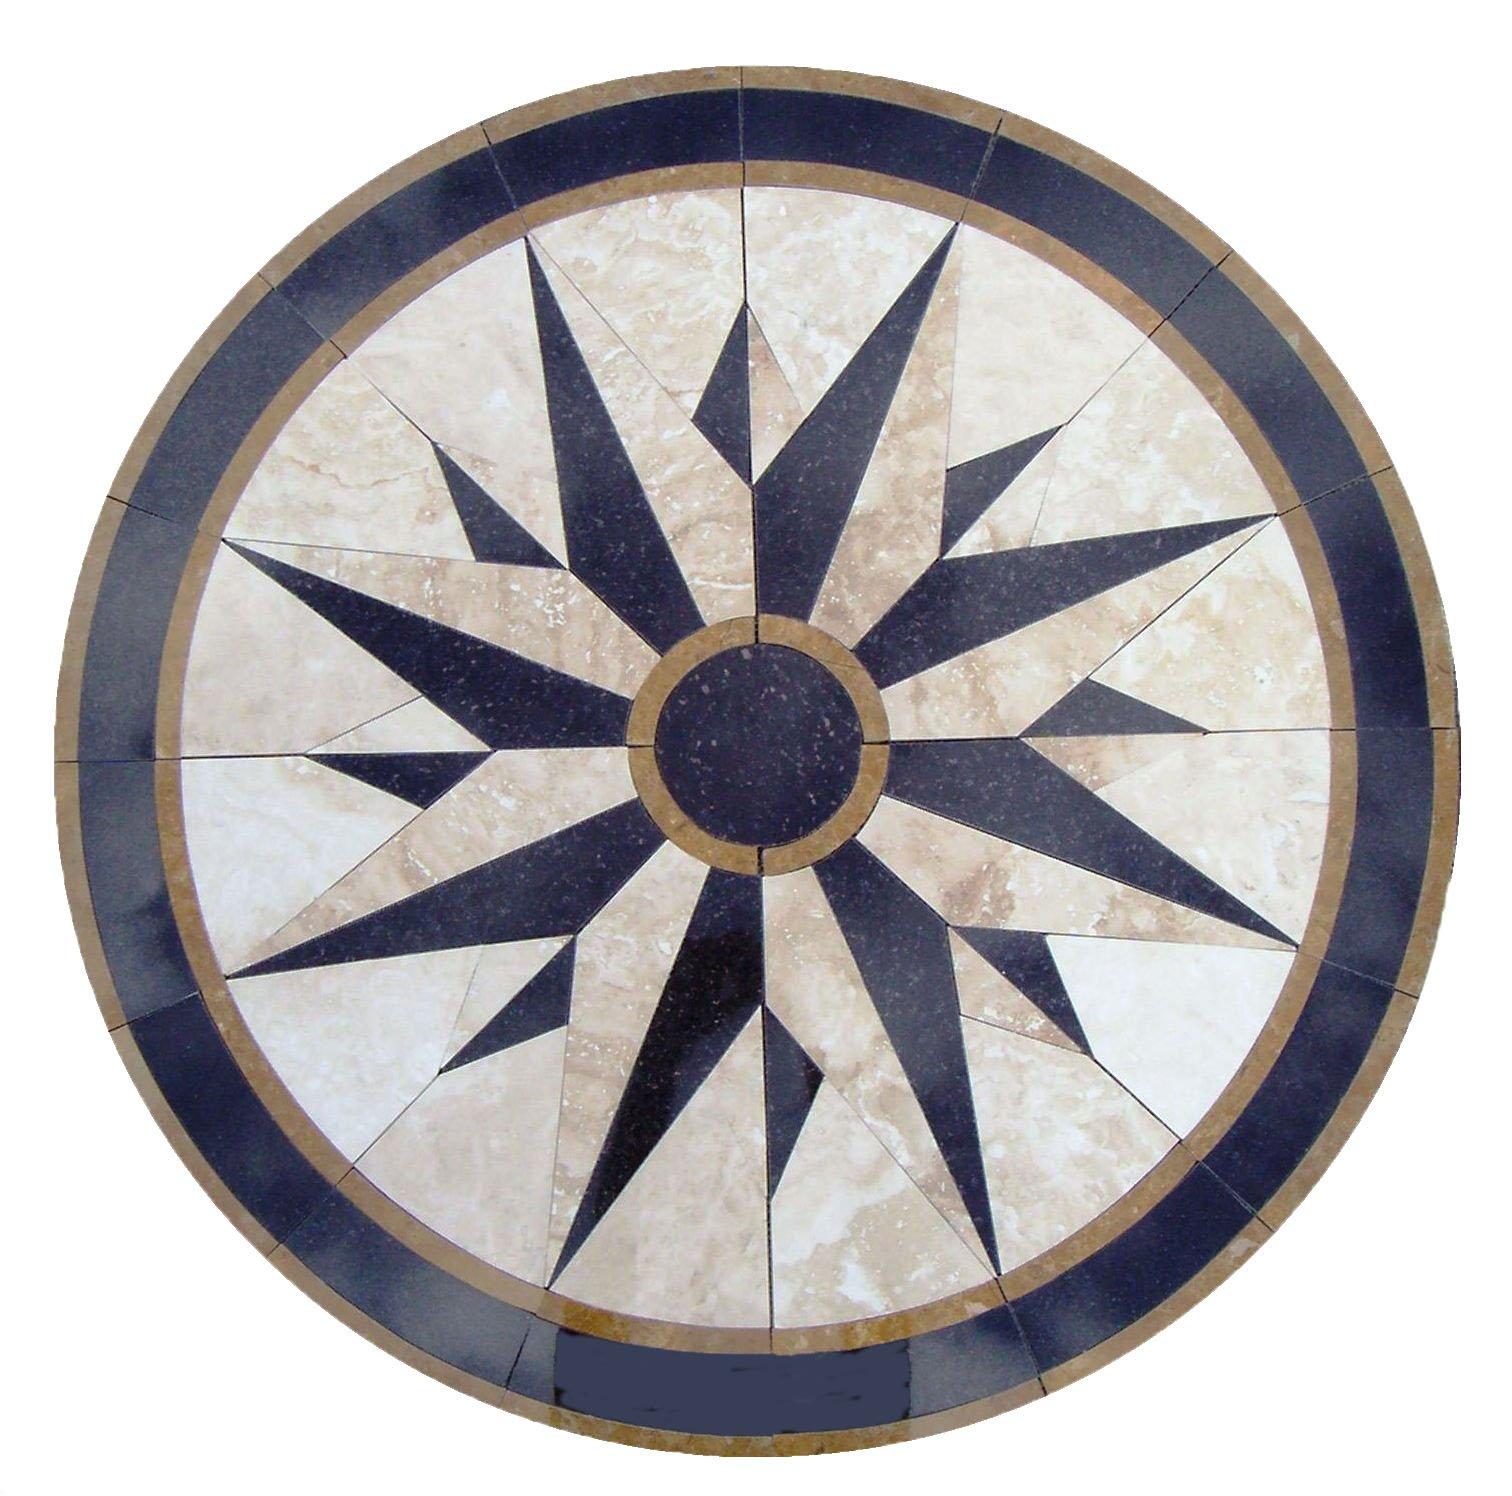 Tile Floor Medallion Marble Mosaic Compass North Star Design 40''